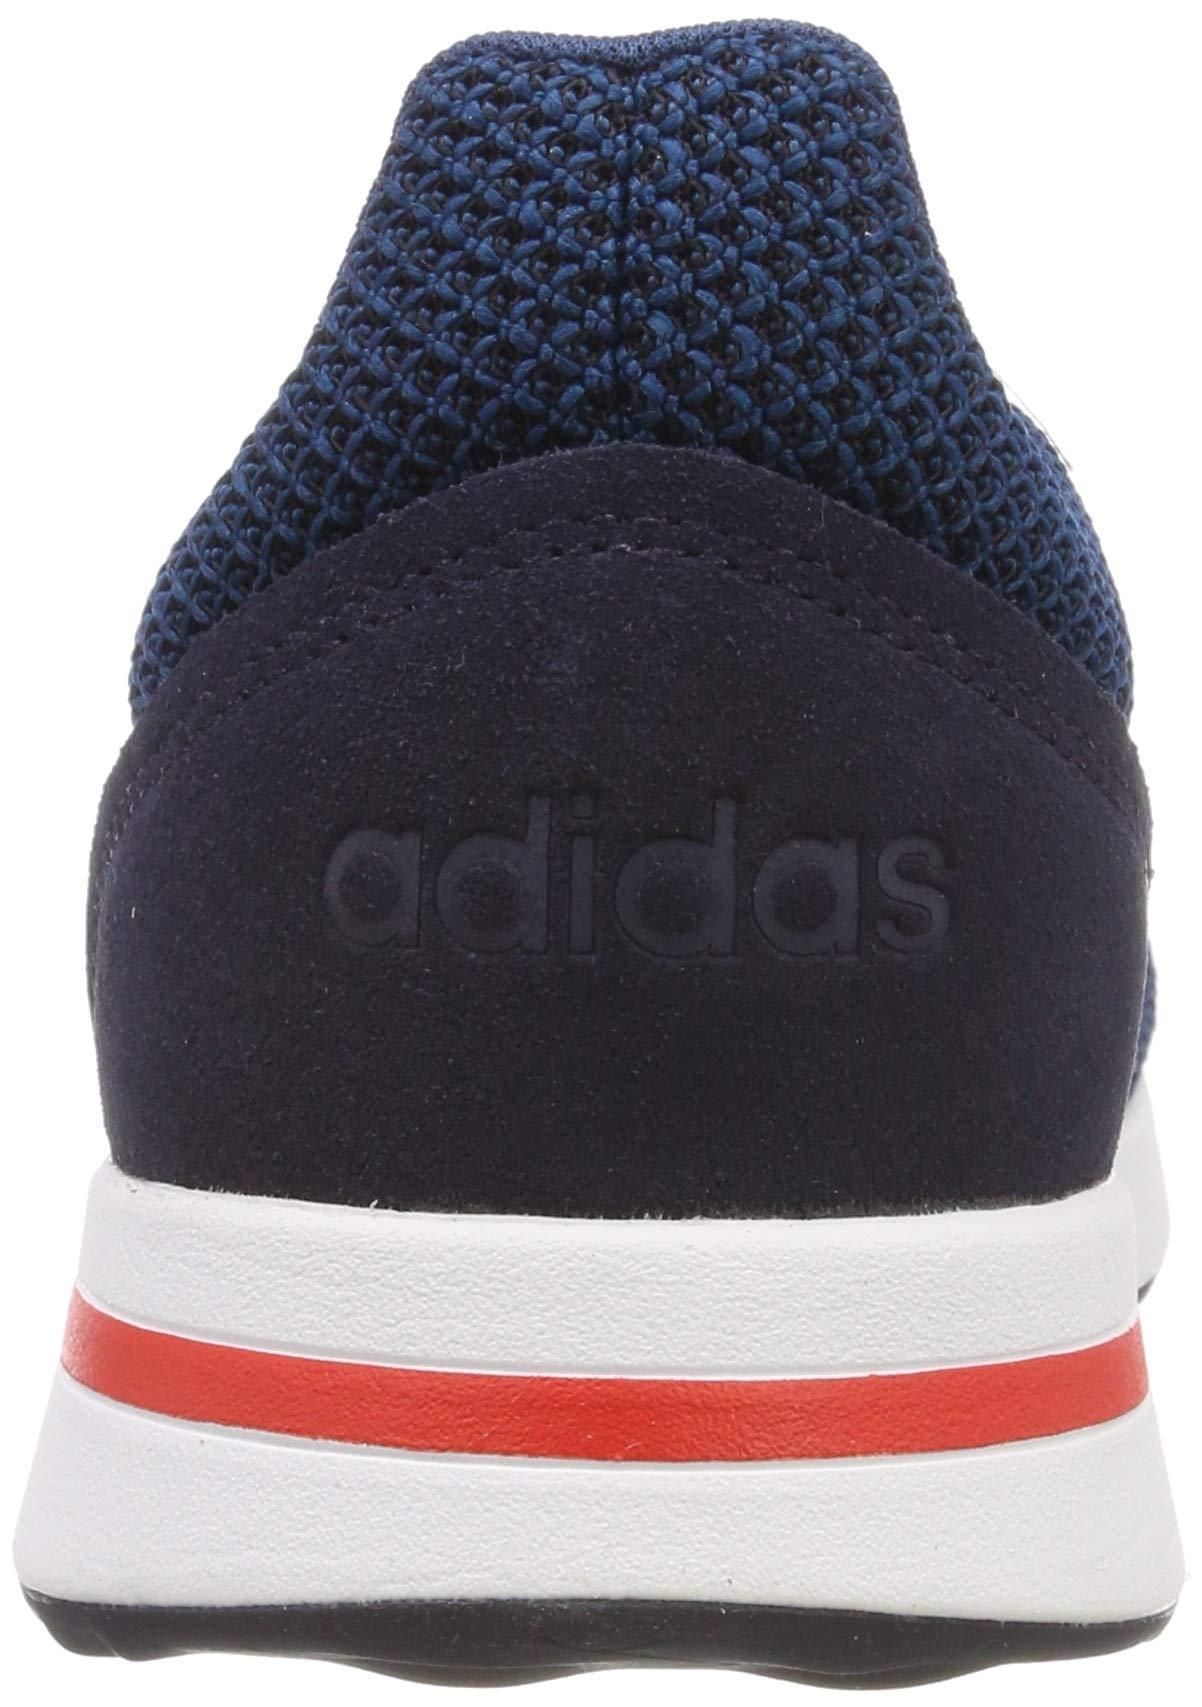 adidas Run70s, Scarpe da Running Uomo 7 spesavip